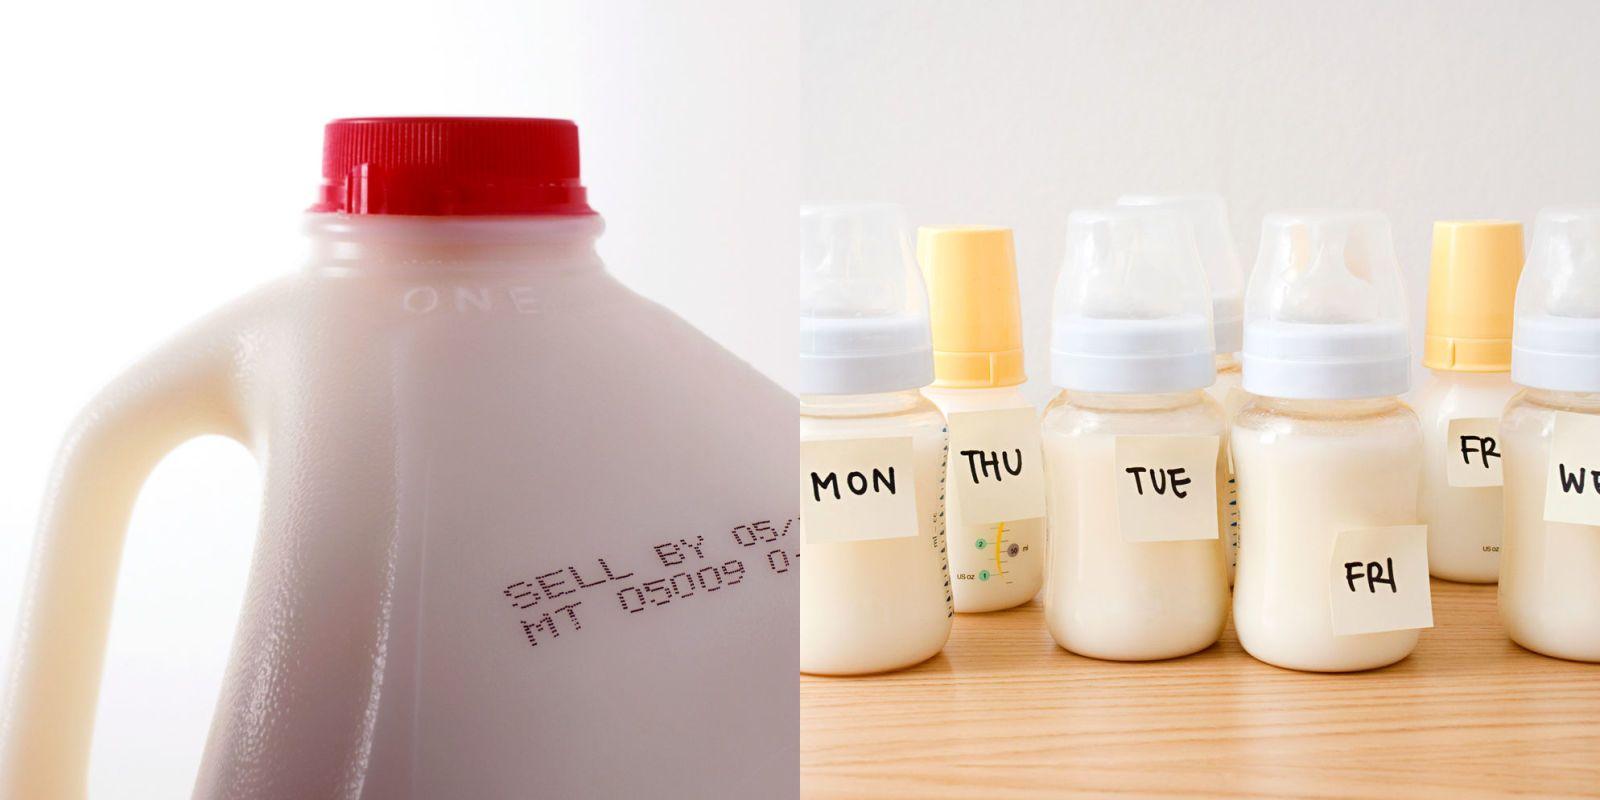 Breast milk dating site